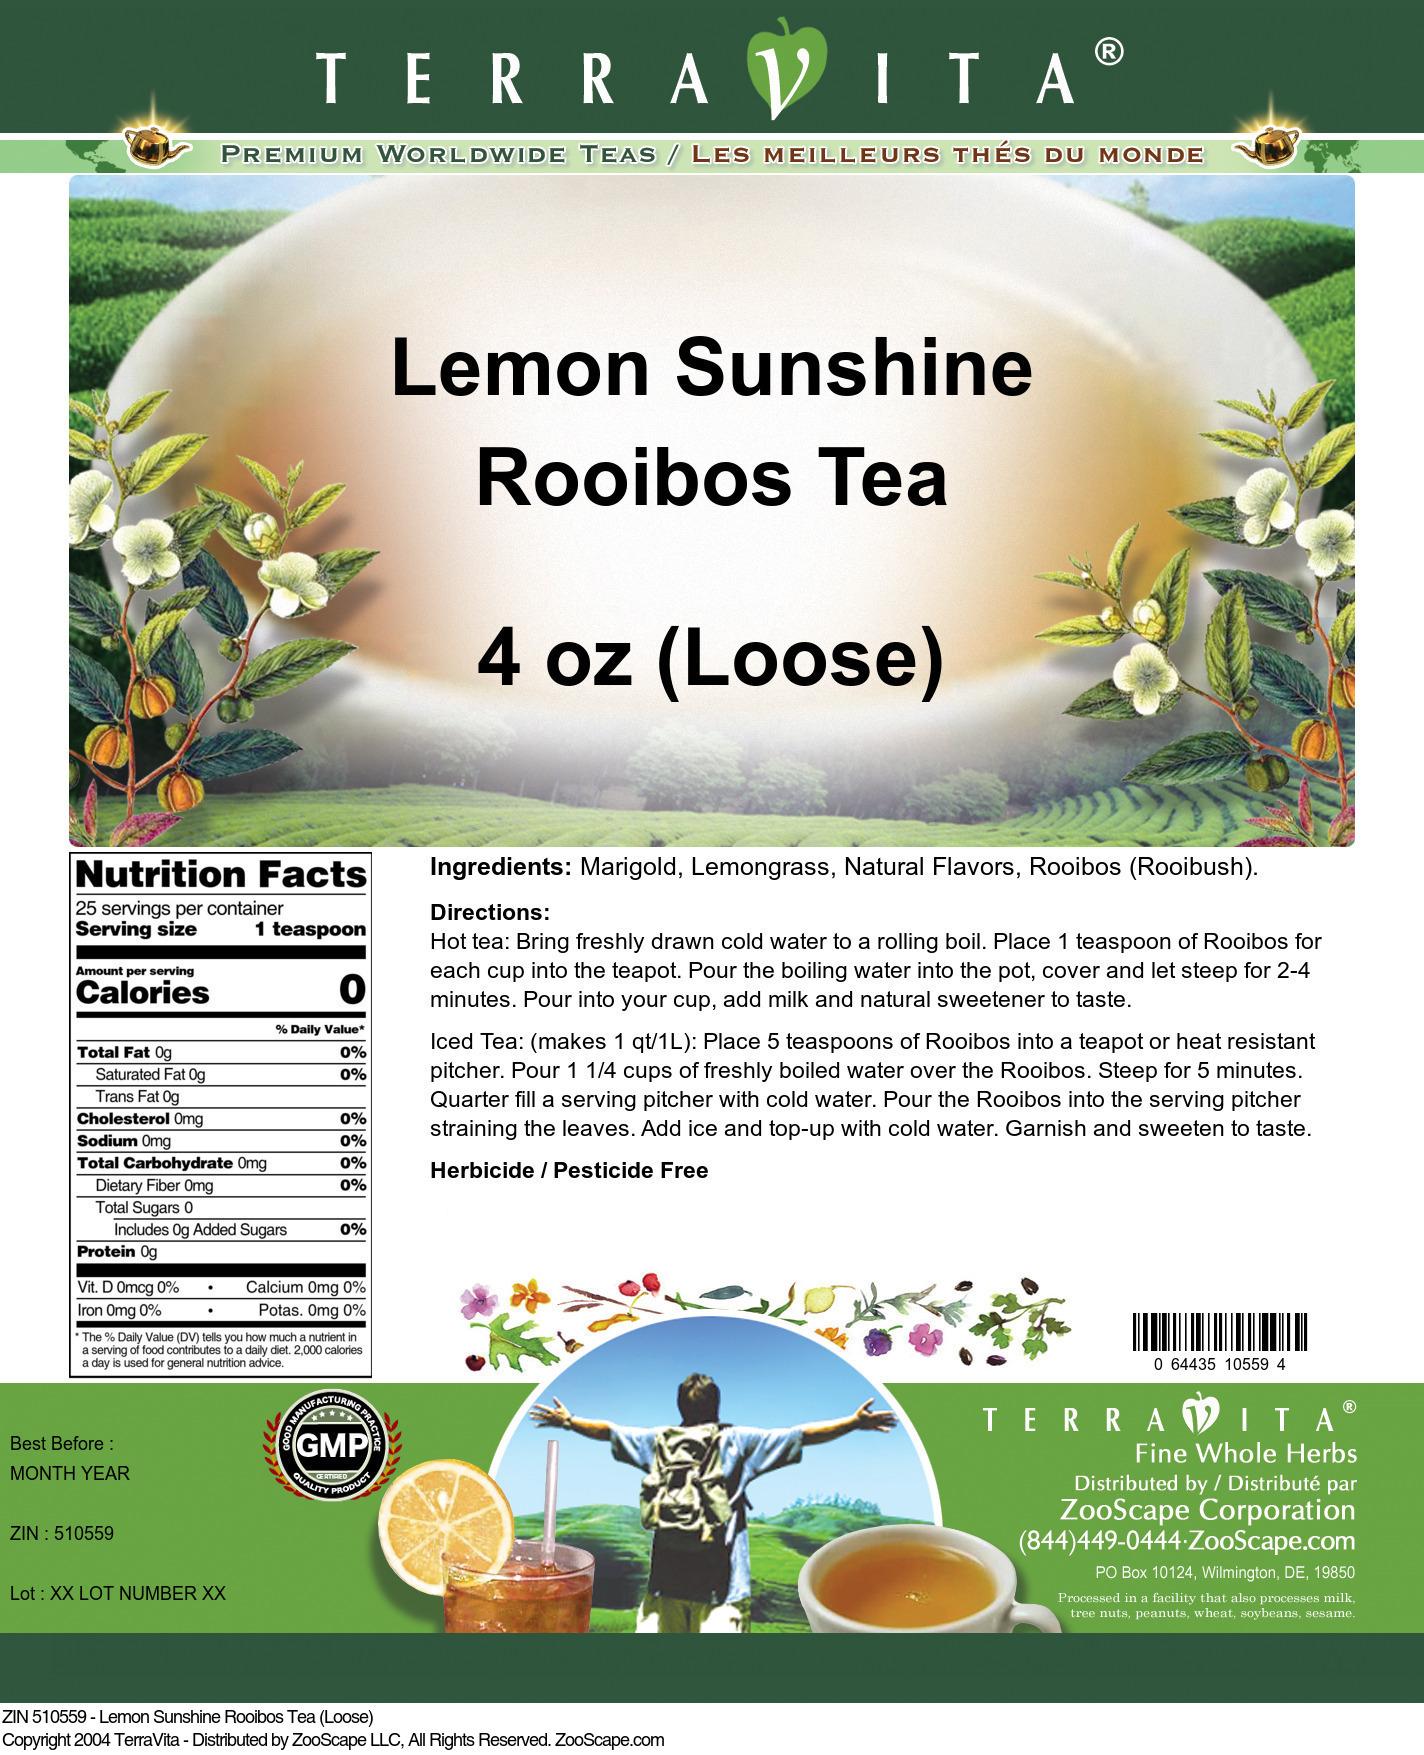 Lemon Sunshine Rooibos